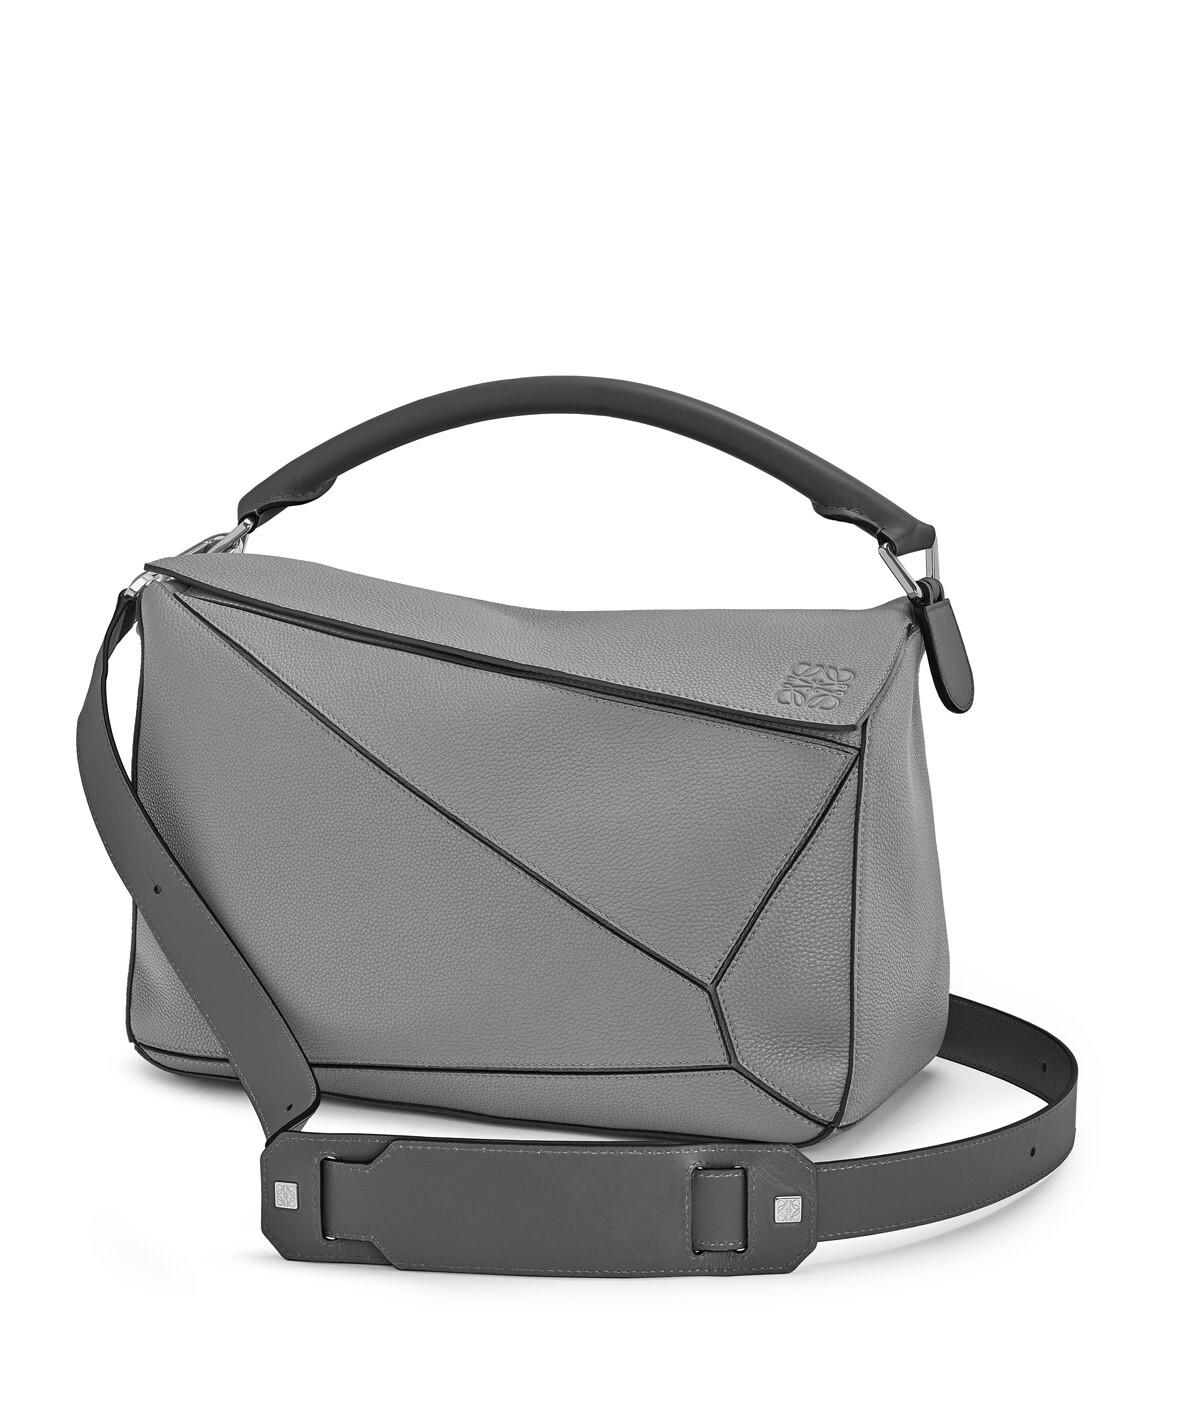 LOEWE Puzzle Large Bag 青铜色 front